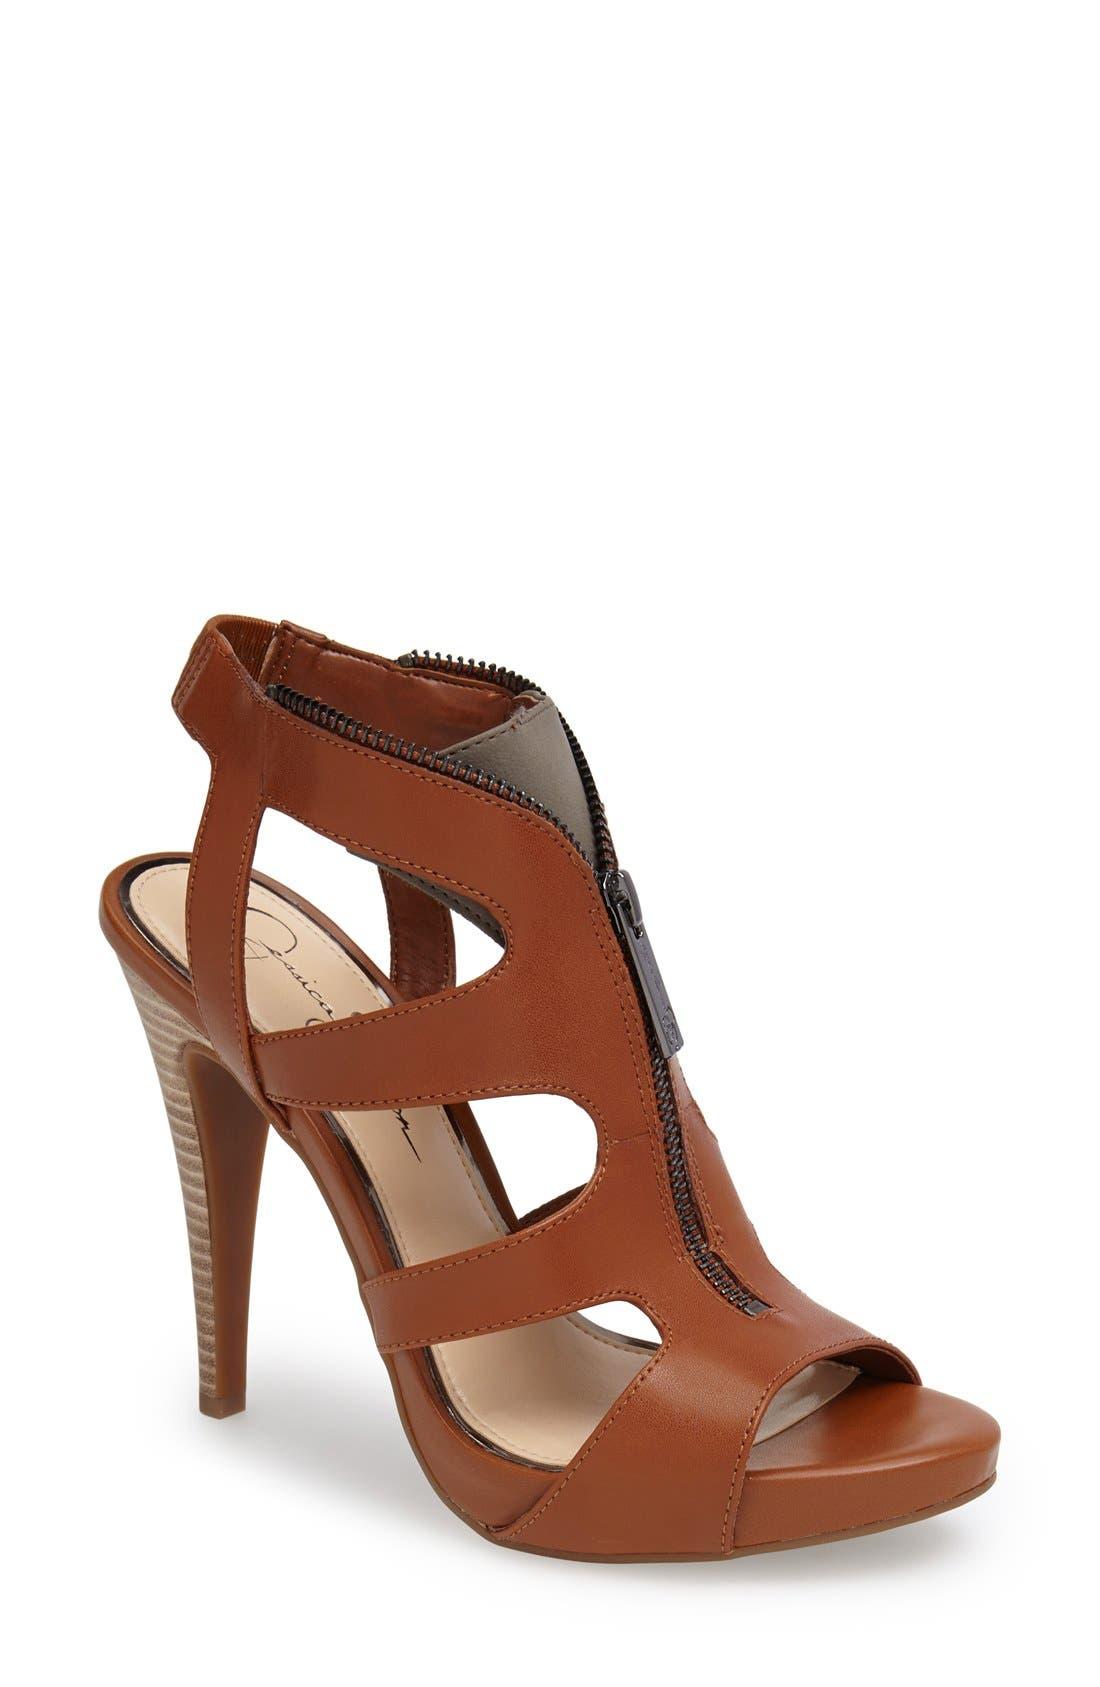 Main Image - Jessica Simpson 'Carmyne' Leather Sandal (Women)